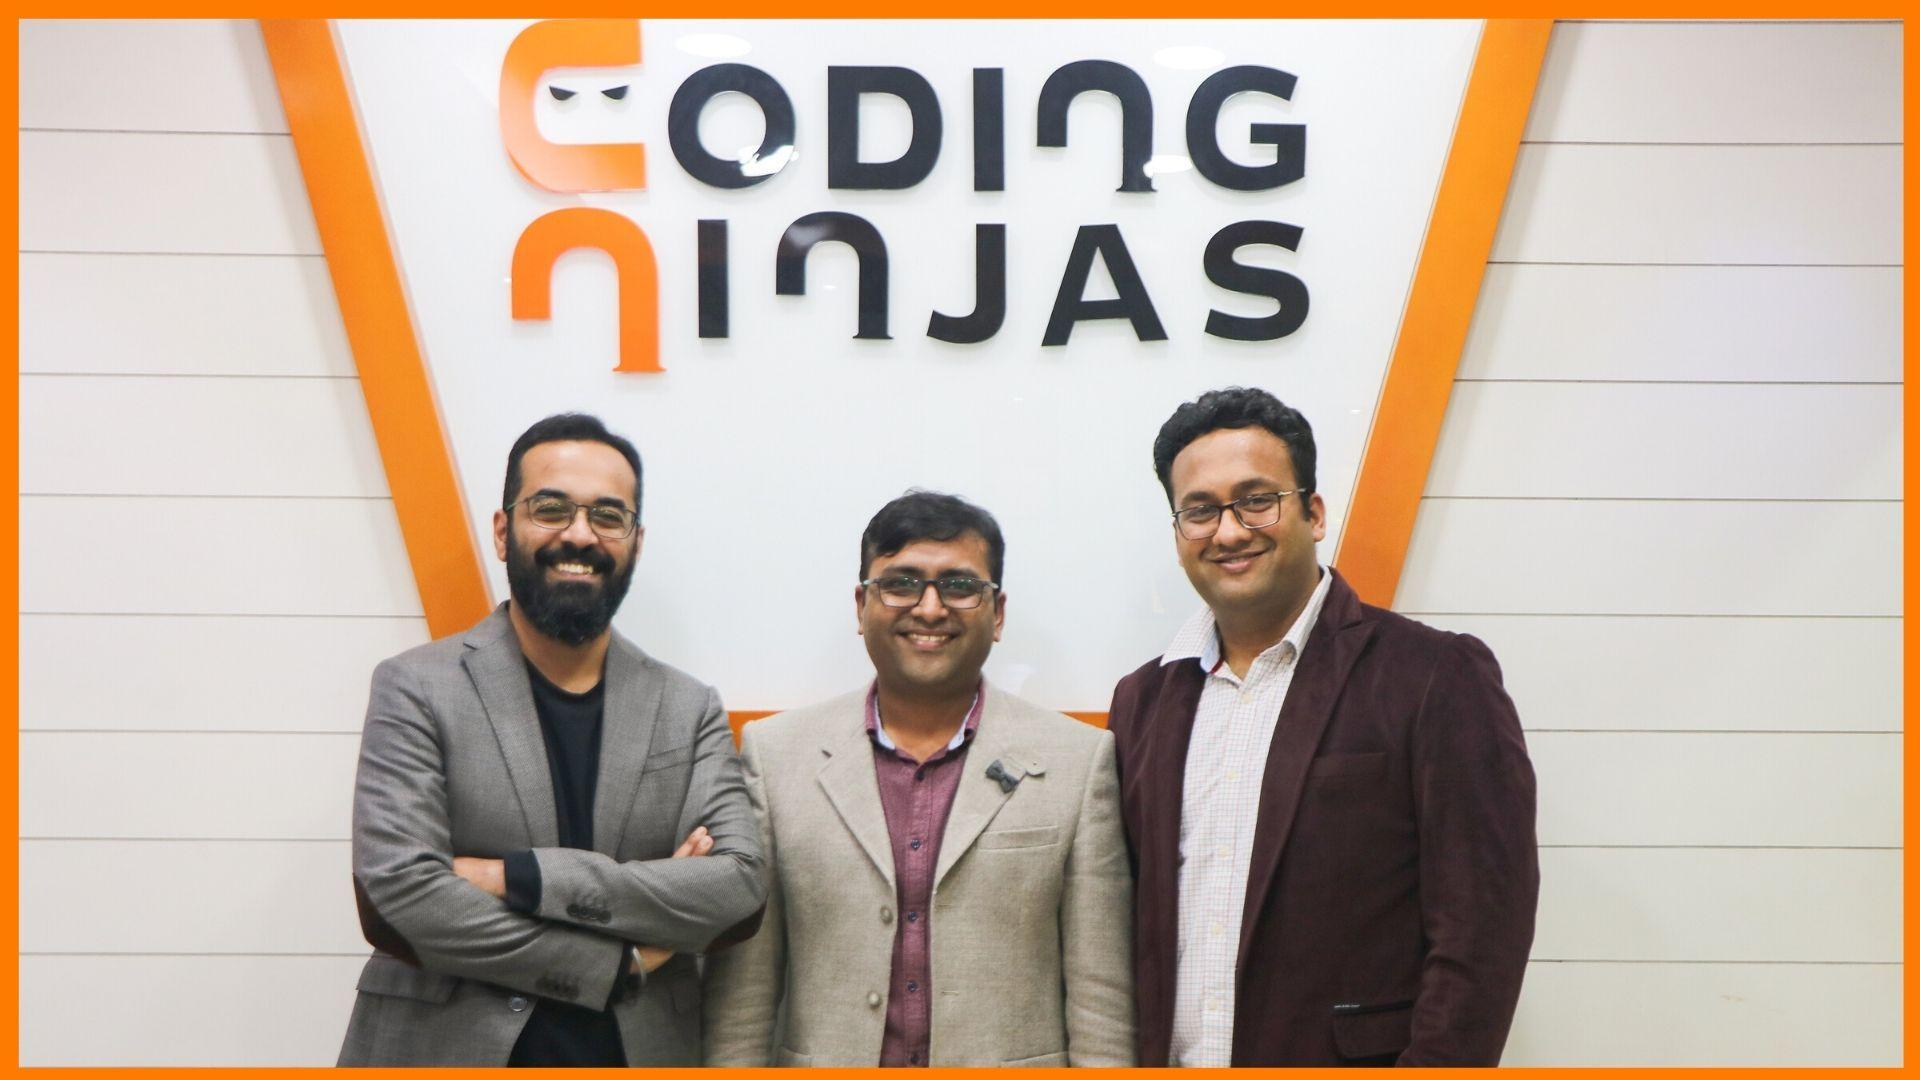 Founders of Coding Ninjas